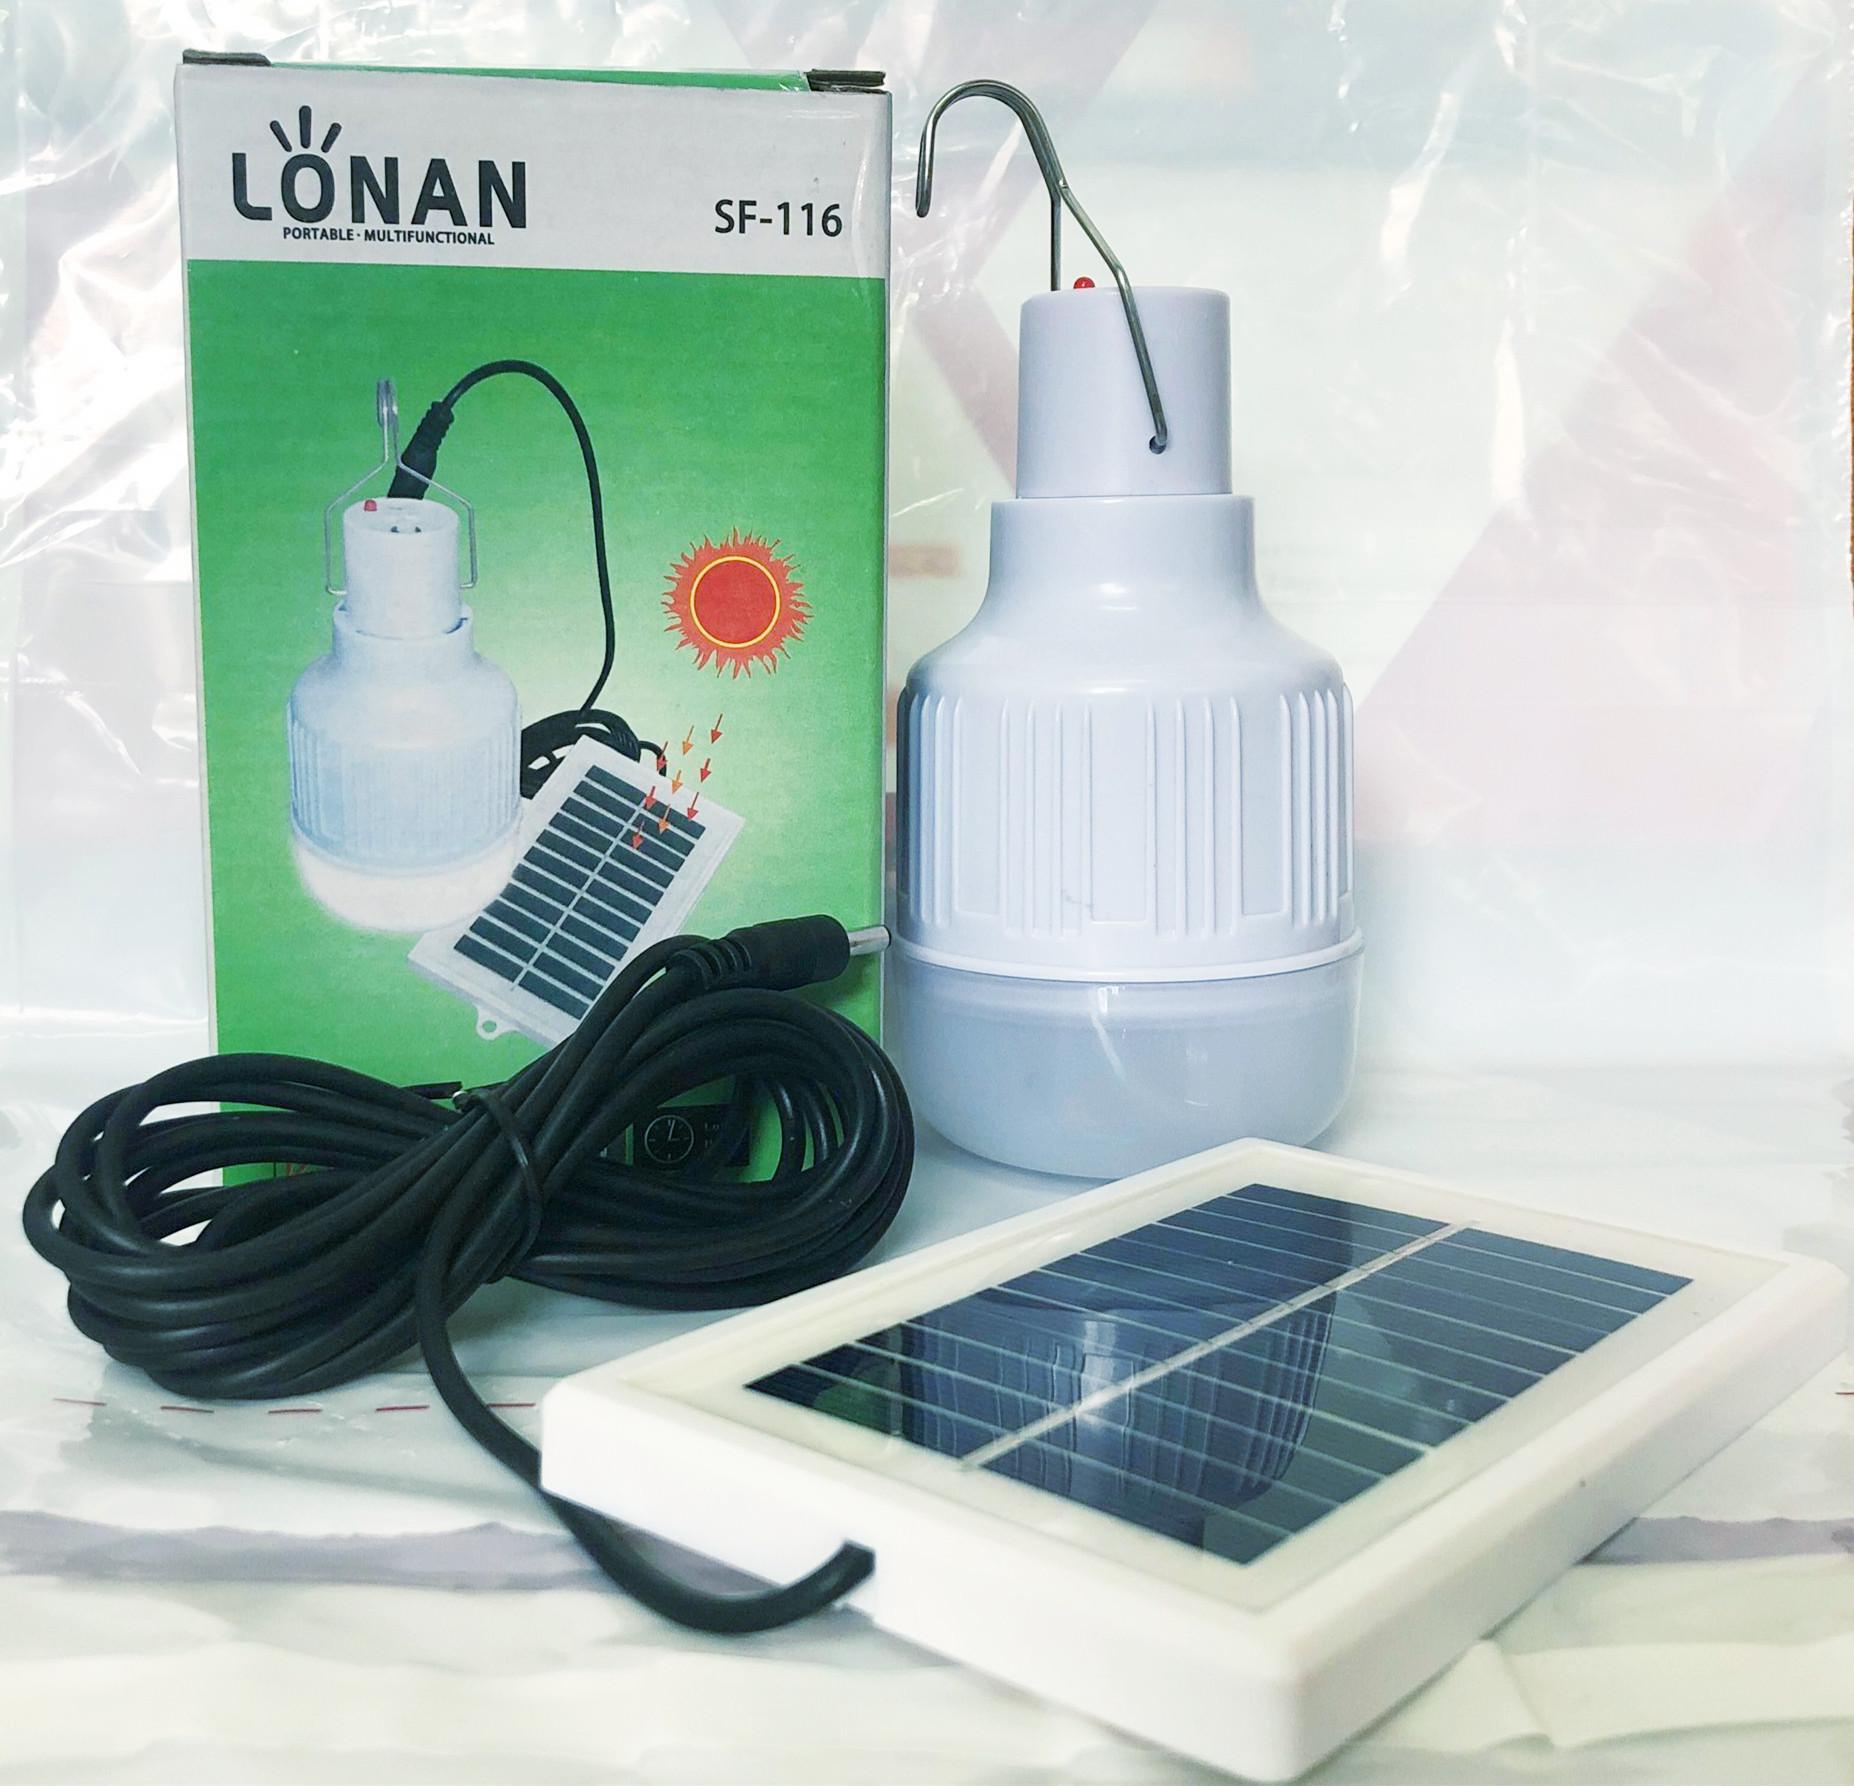 da05be1e2 SOLAR LED SF-116 Portable Solar Energy Panel Lighting System Camping Bulbs  Lamp